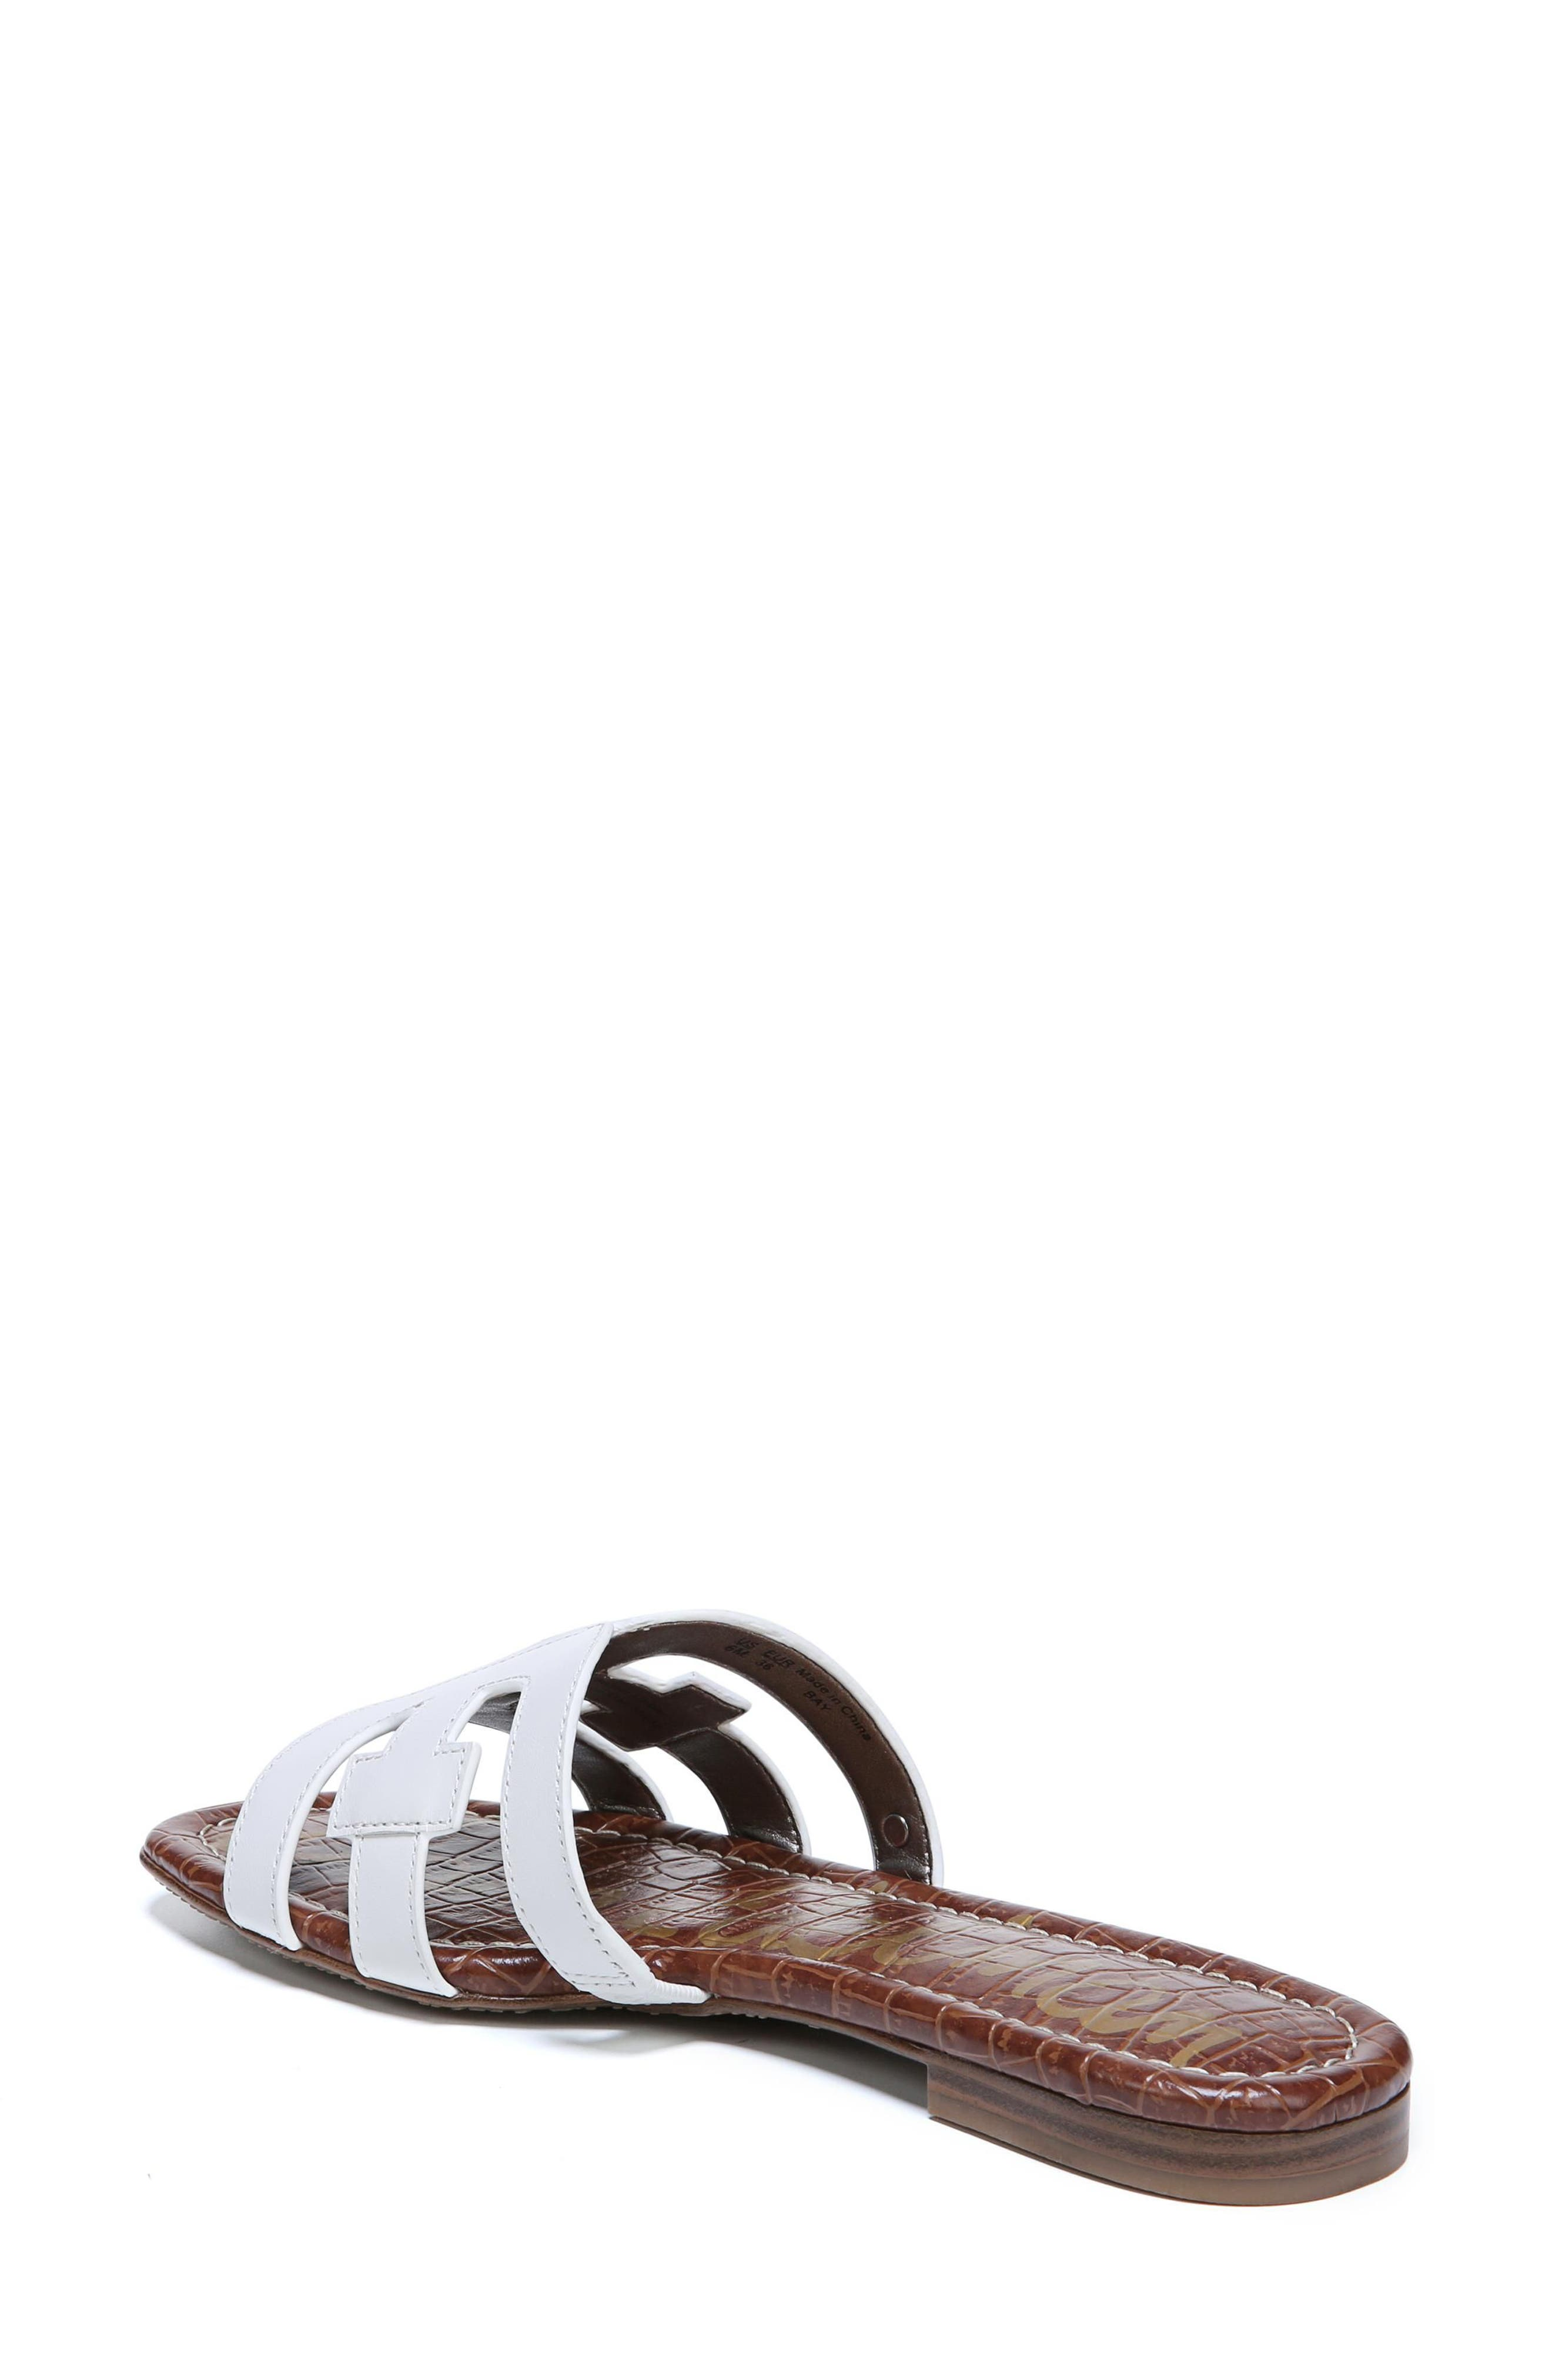 Bay Cutout Slide Sandal,                             Alternate thumbnail 2, color,                             Bright White Leather